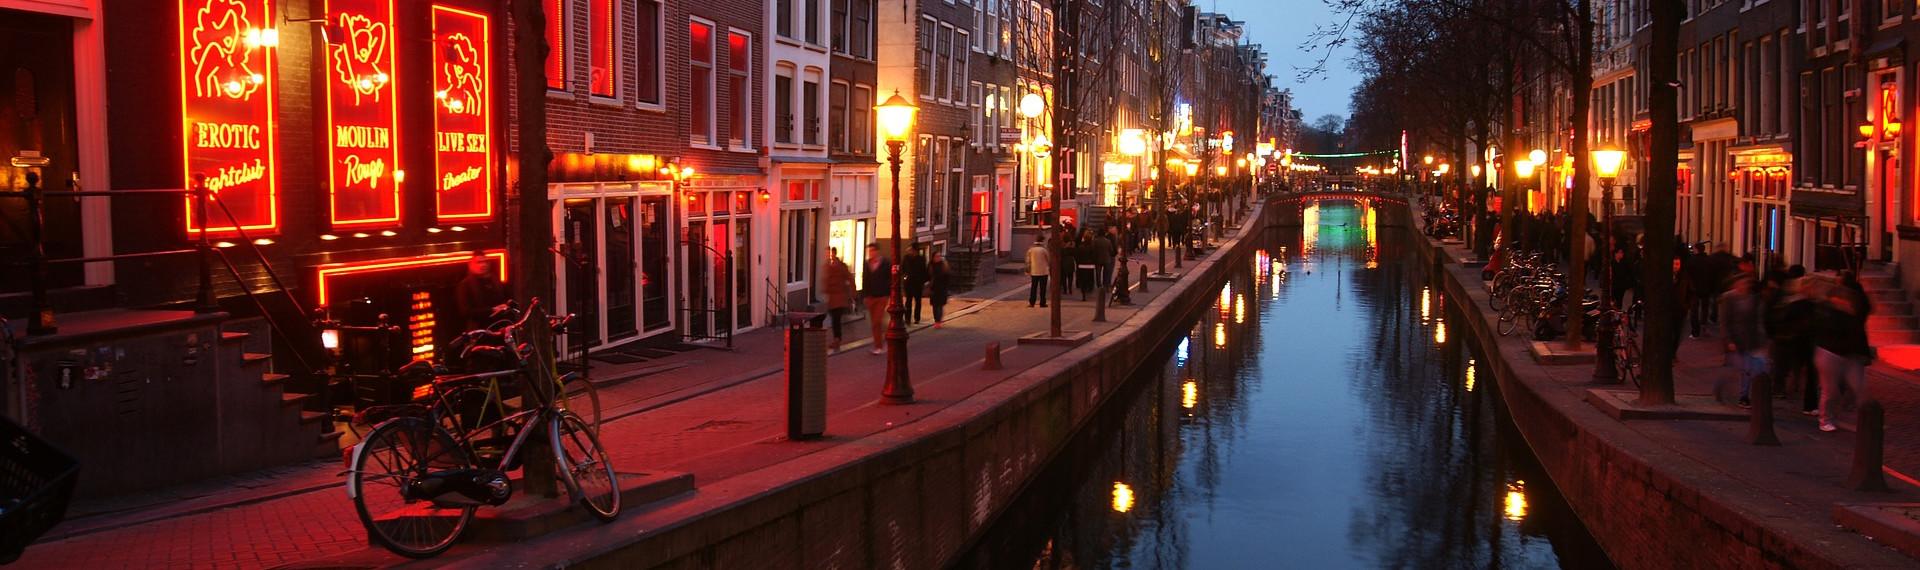 Pub Crawl im Rotlichtviertel Amsterdam